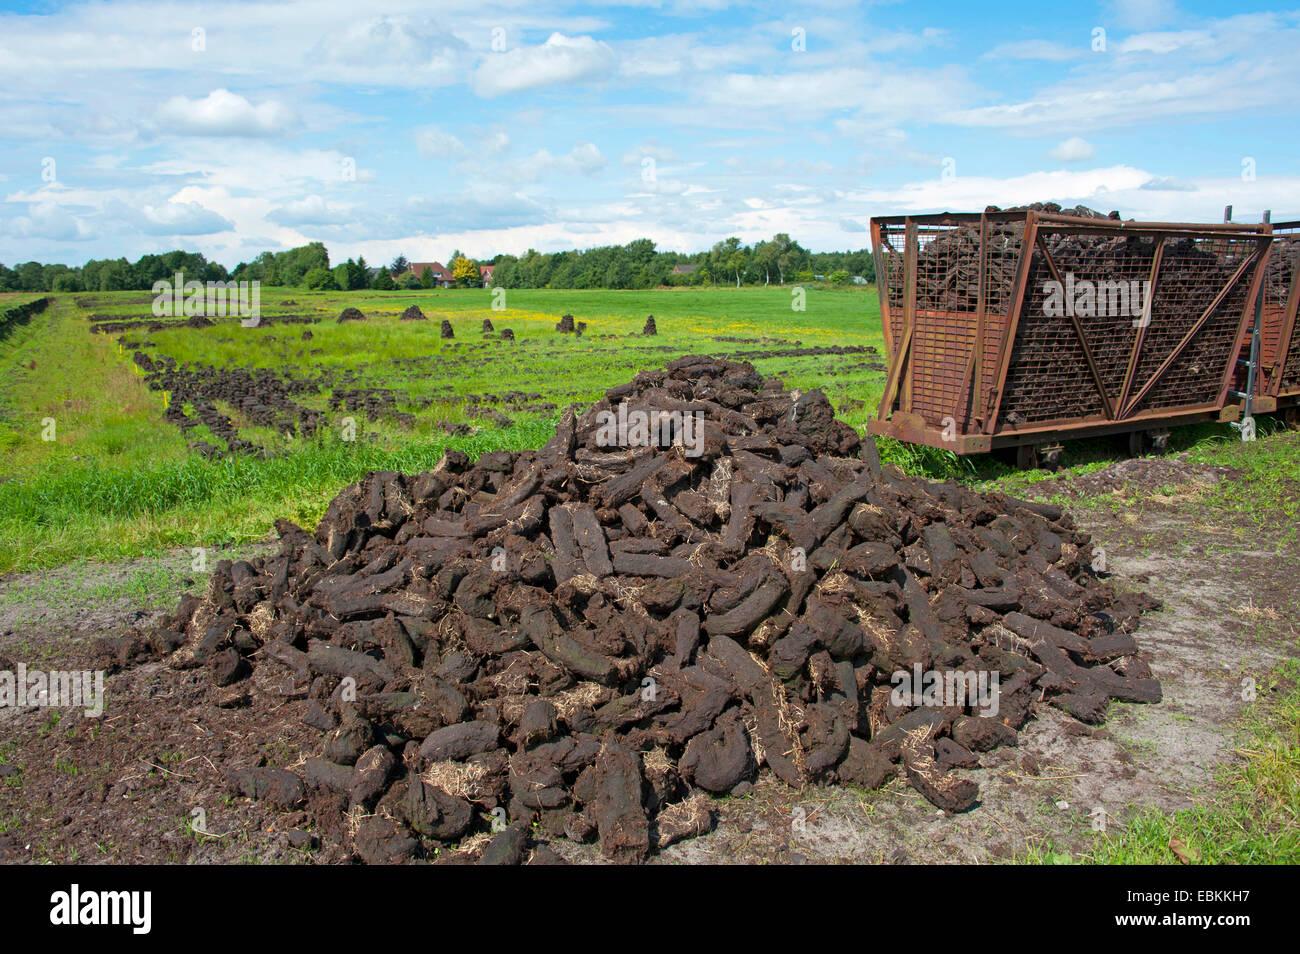 peat cutting, sods of peat, Germany, Lower Saxony, Wilhelmsfehn - Stock Image